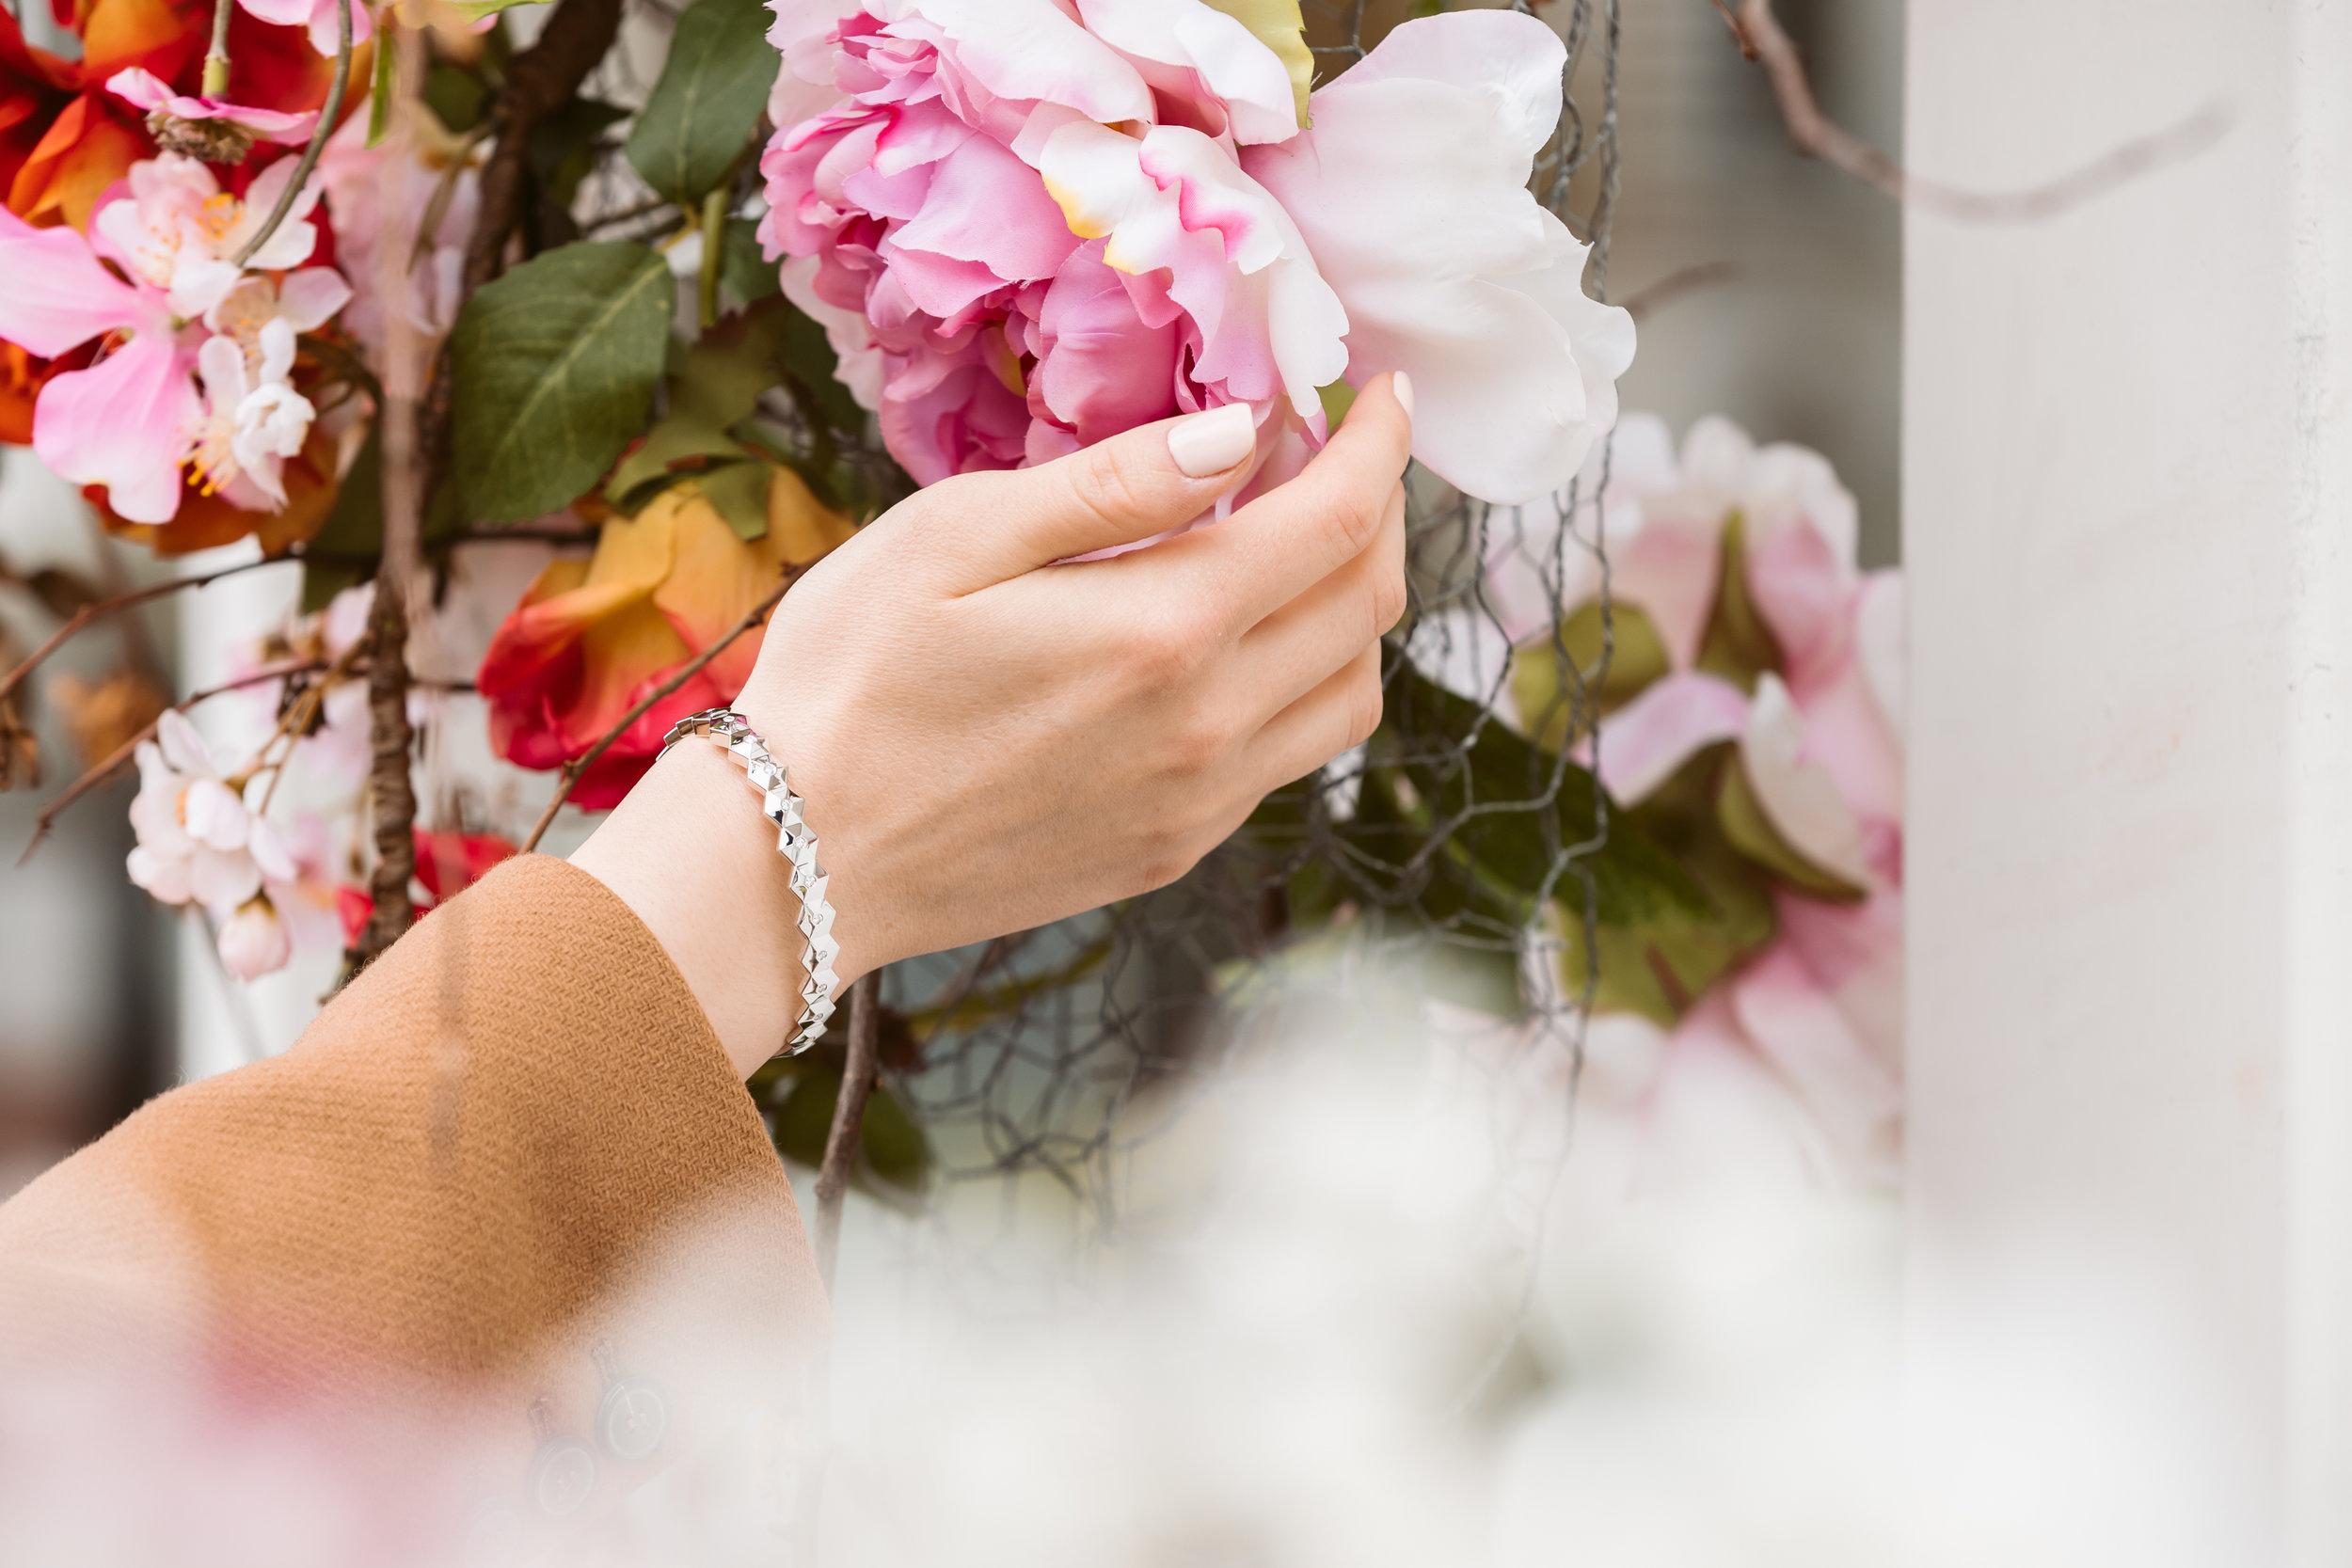 ABE1_Marioni_Jewelry_Lifestyle-69.jpg